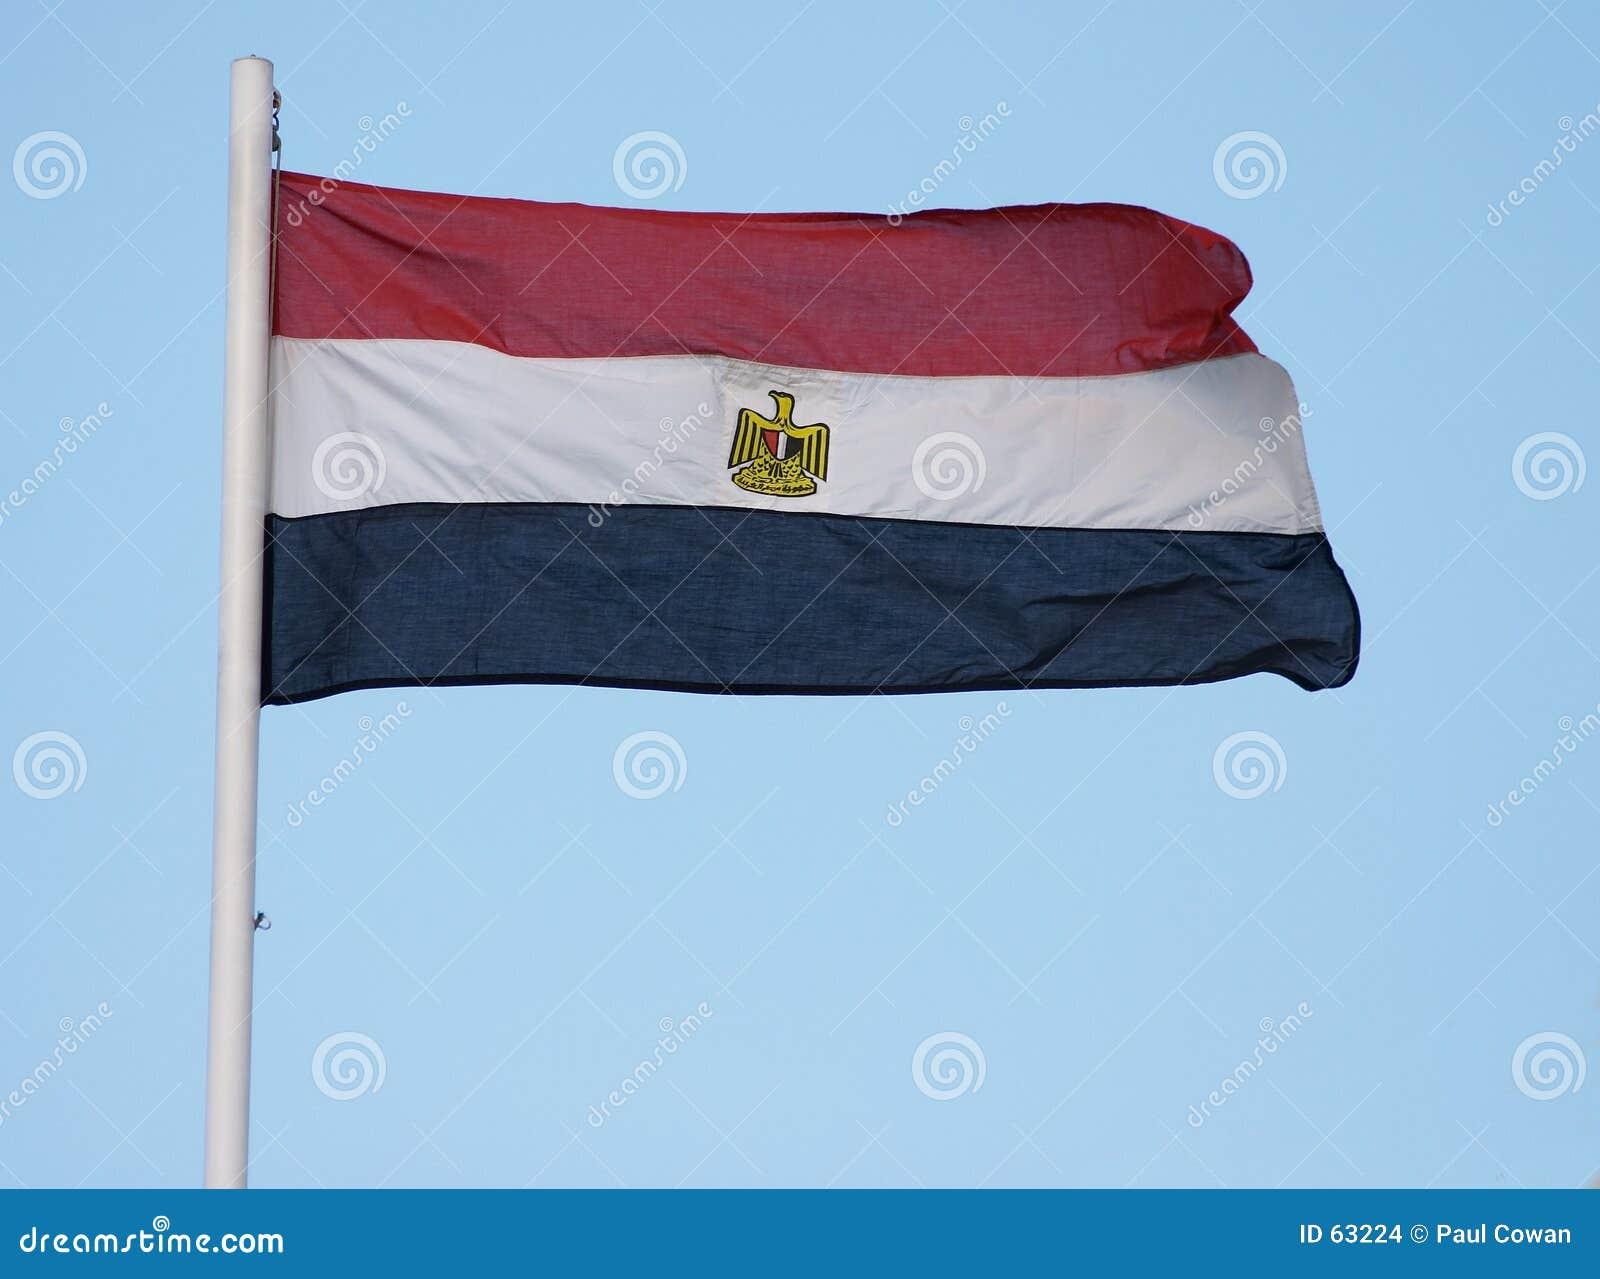 Download αιγυπτιακή σημαία στοκ εικόνες. εικόνα από απαγορευμένα - 63224